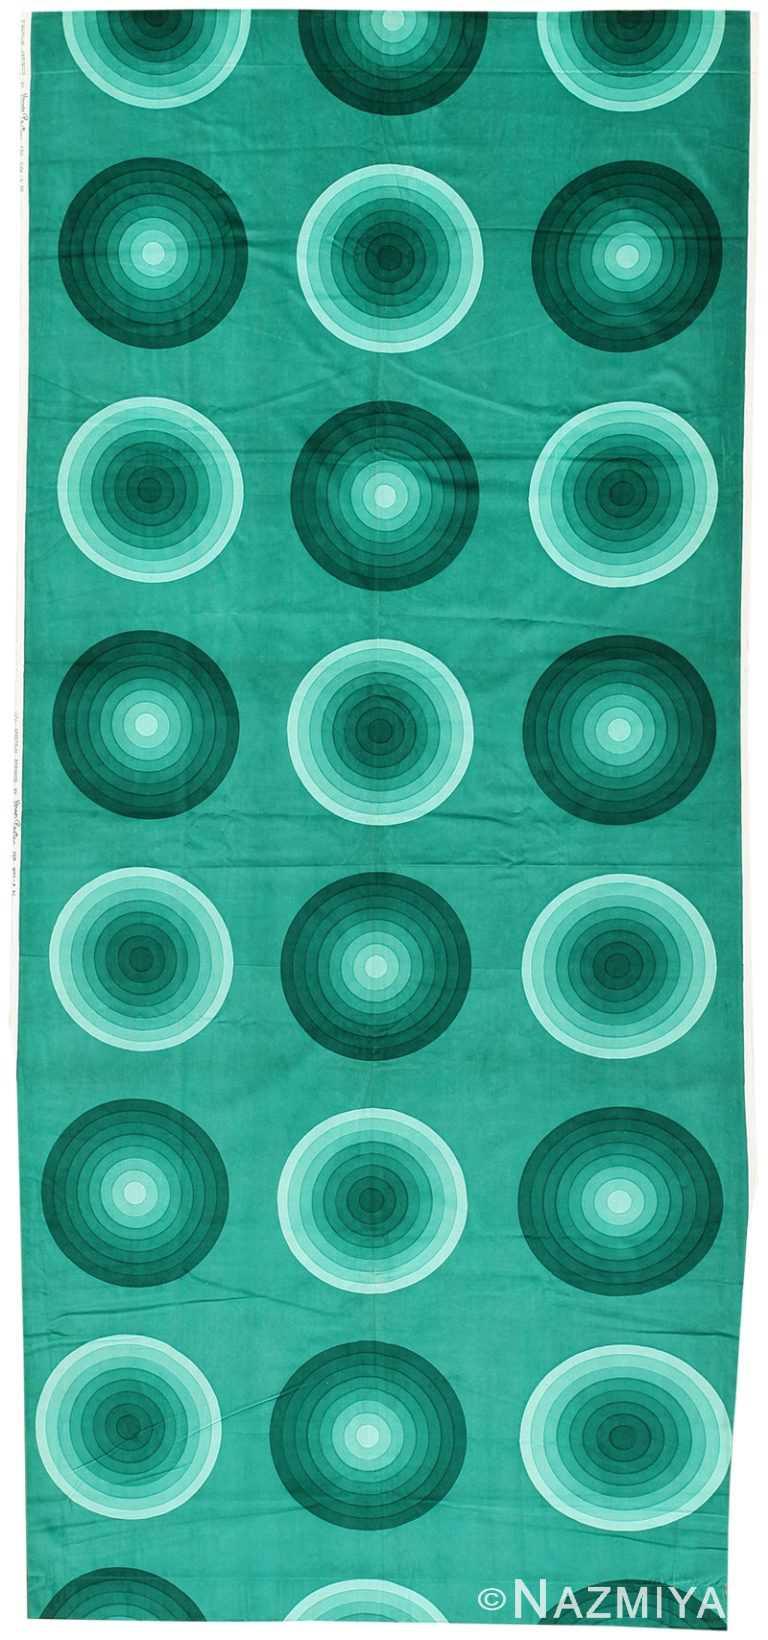 Vintage Scandinavian Verner Panton Kreis Textile 47733 by Nazmiyal NYC